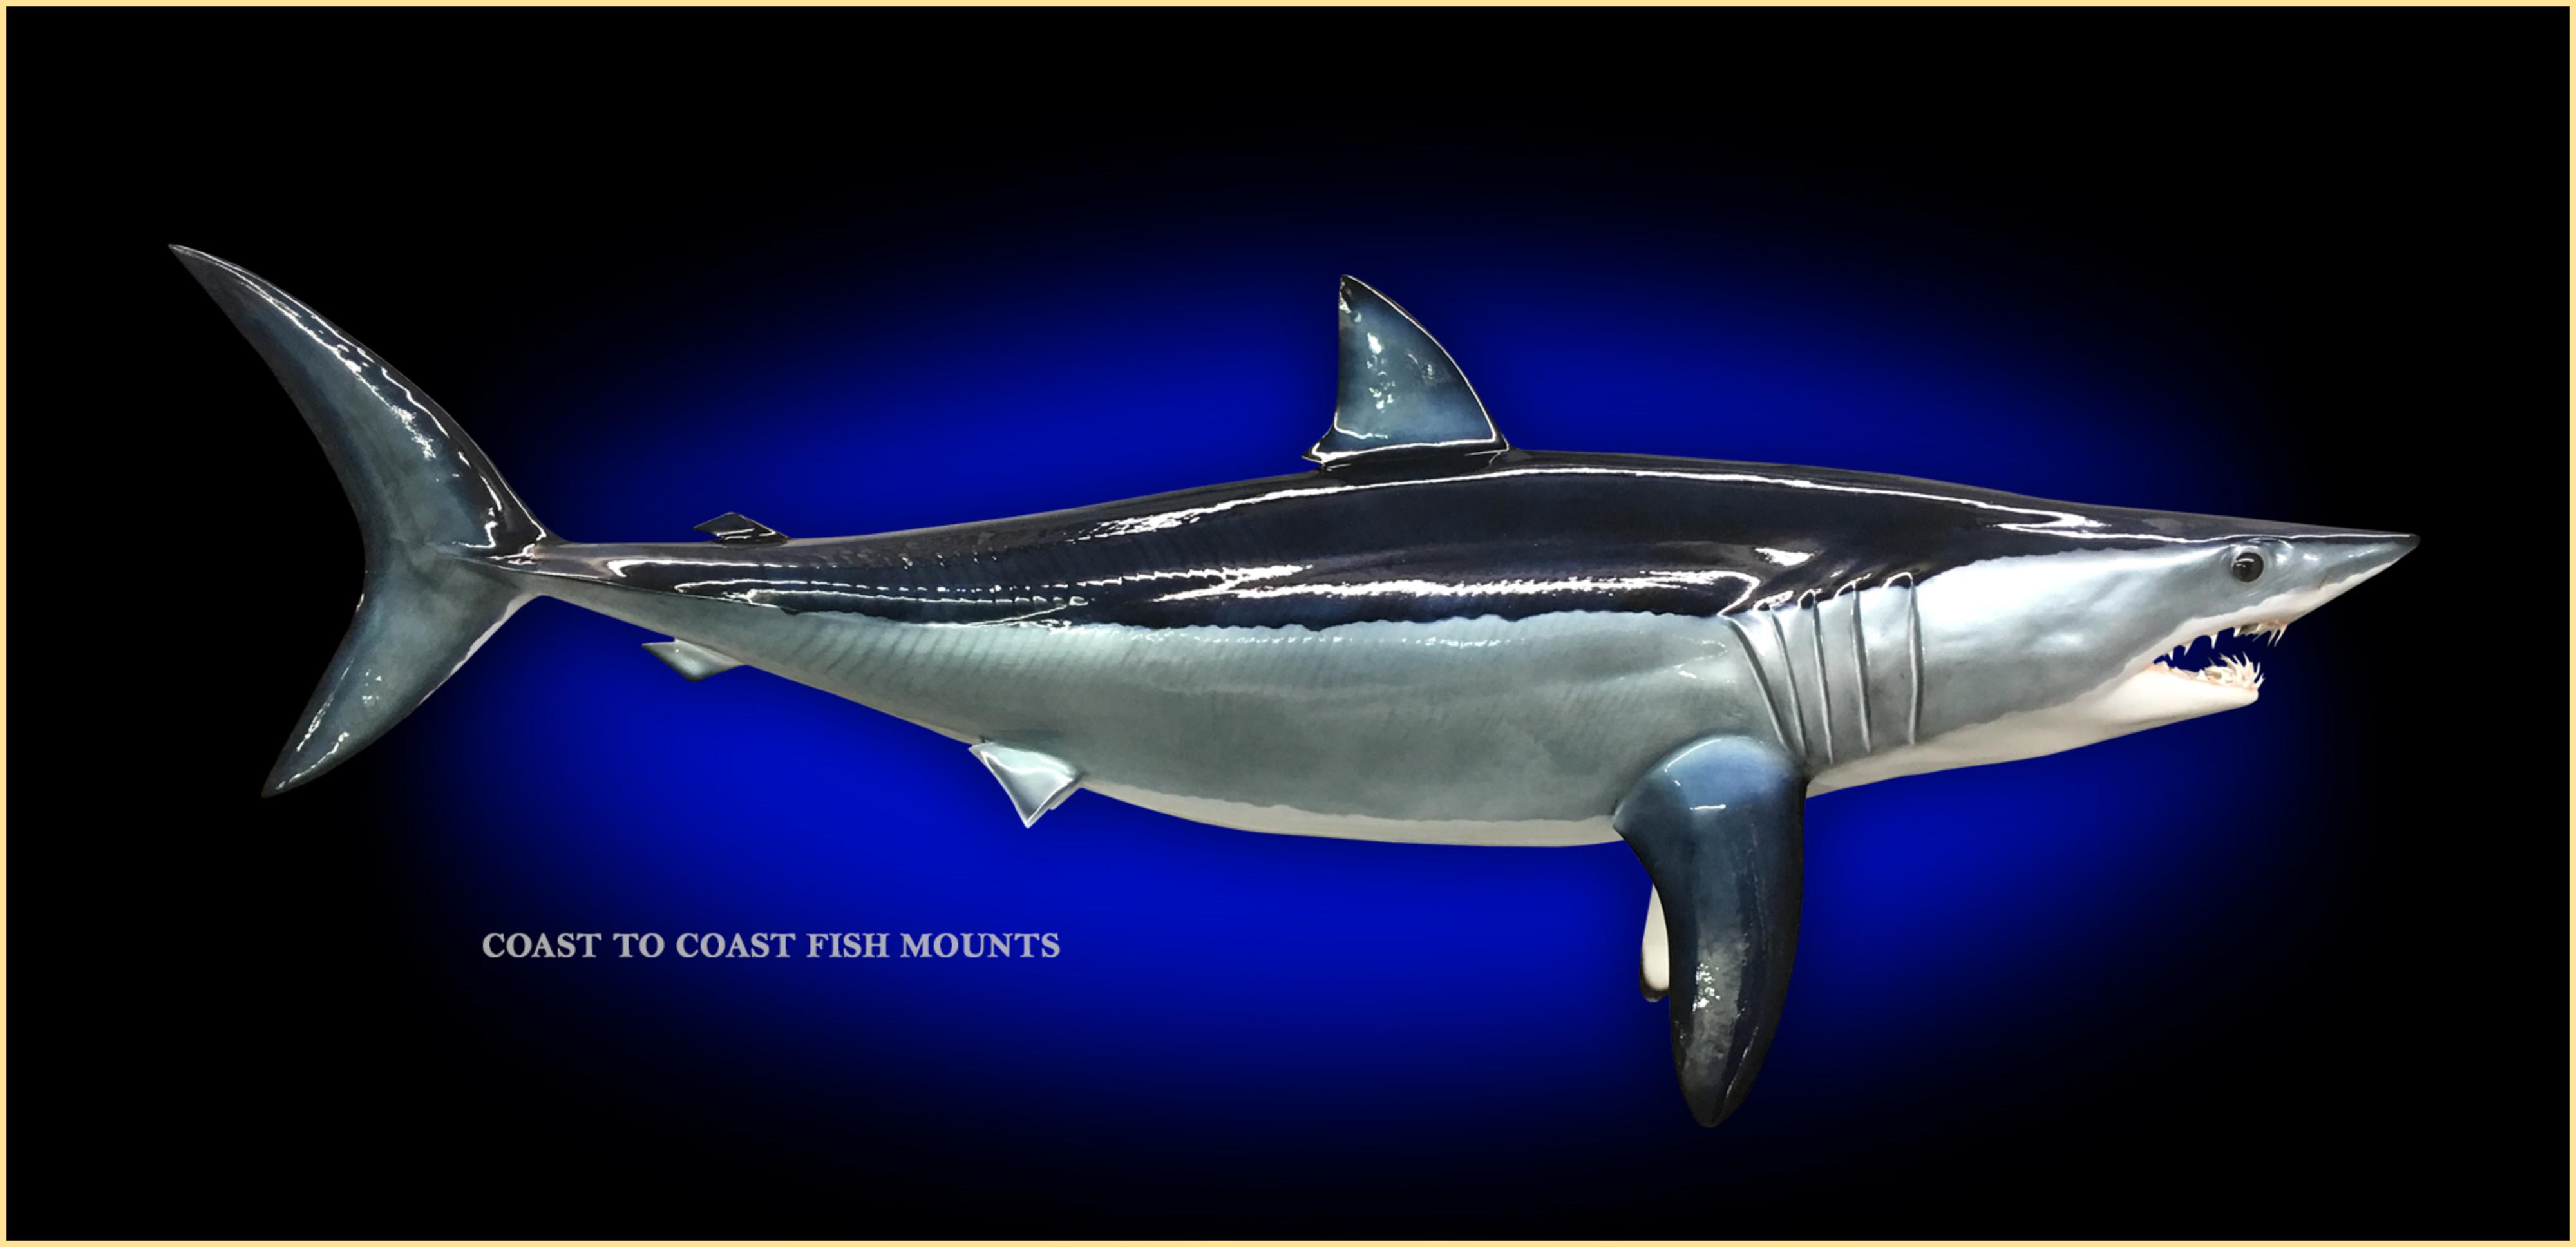 Mako shark fish mount and fish replicas coast to coast mako shark fish mount thecheapjerseys Choice Image